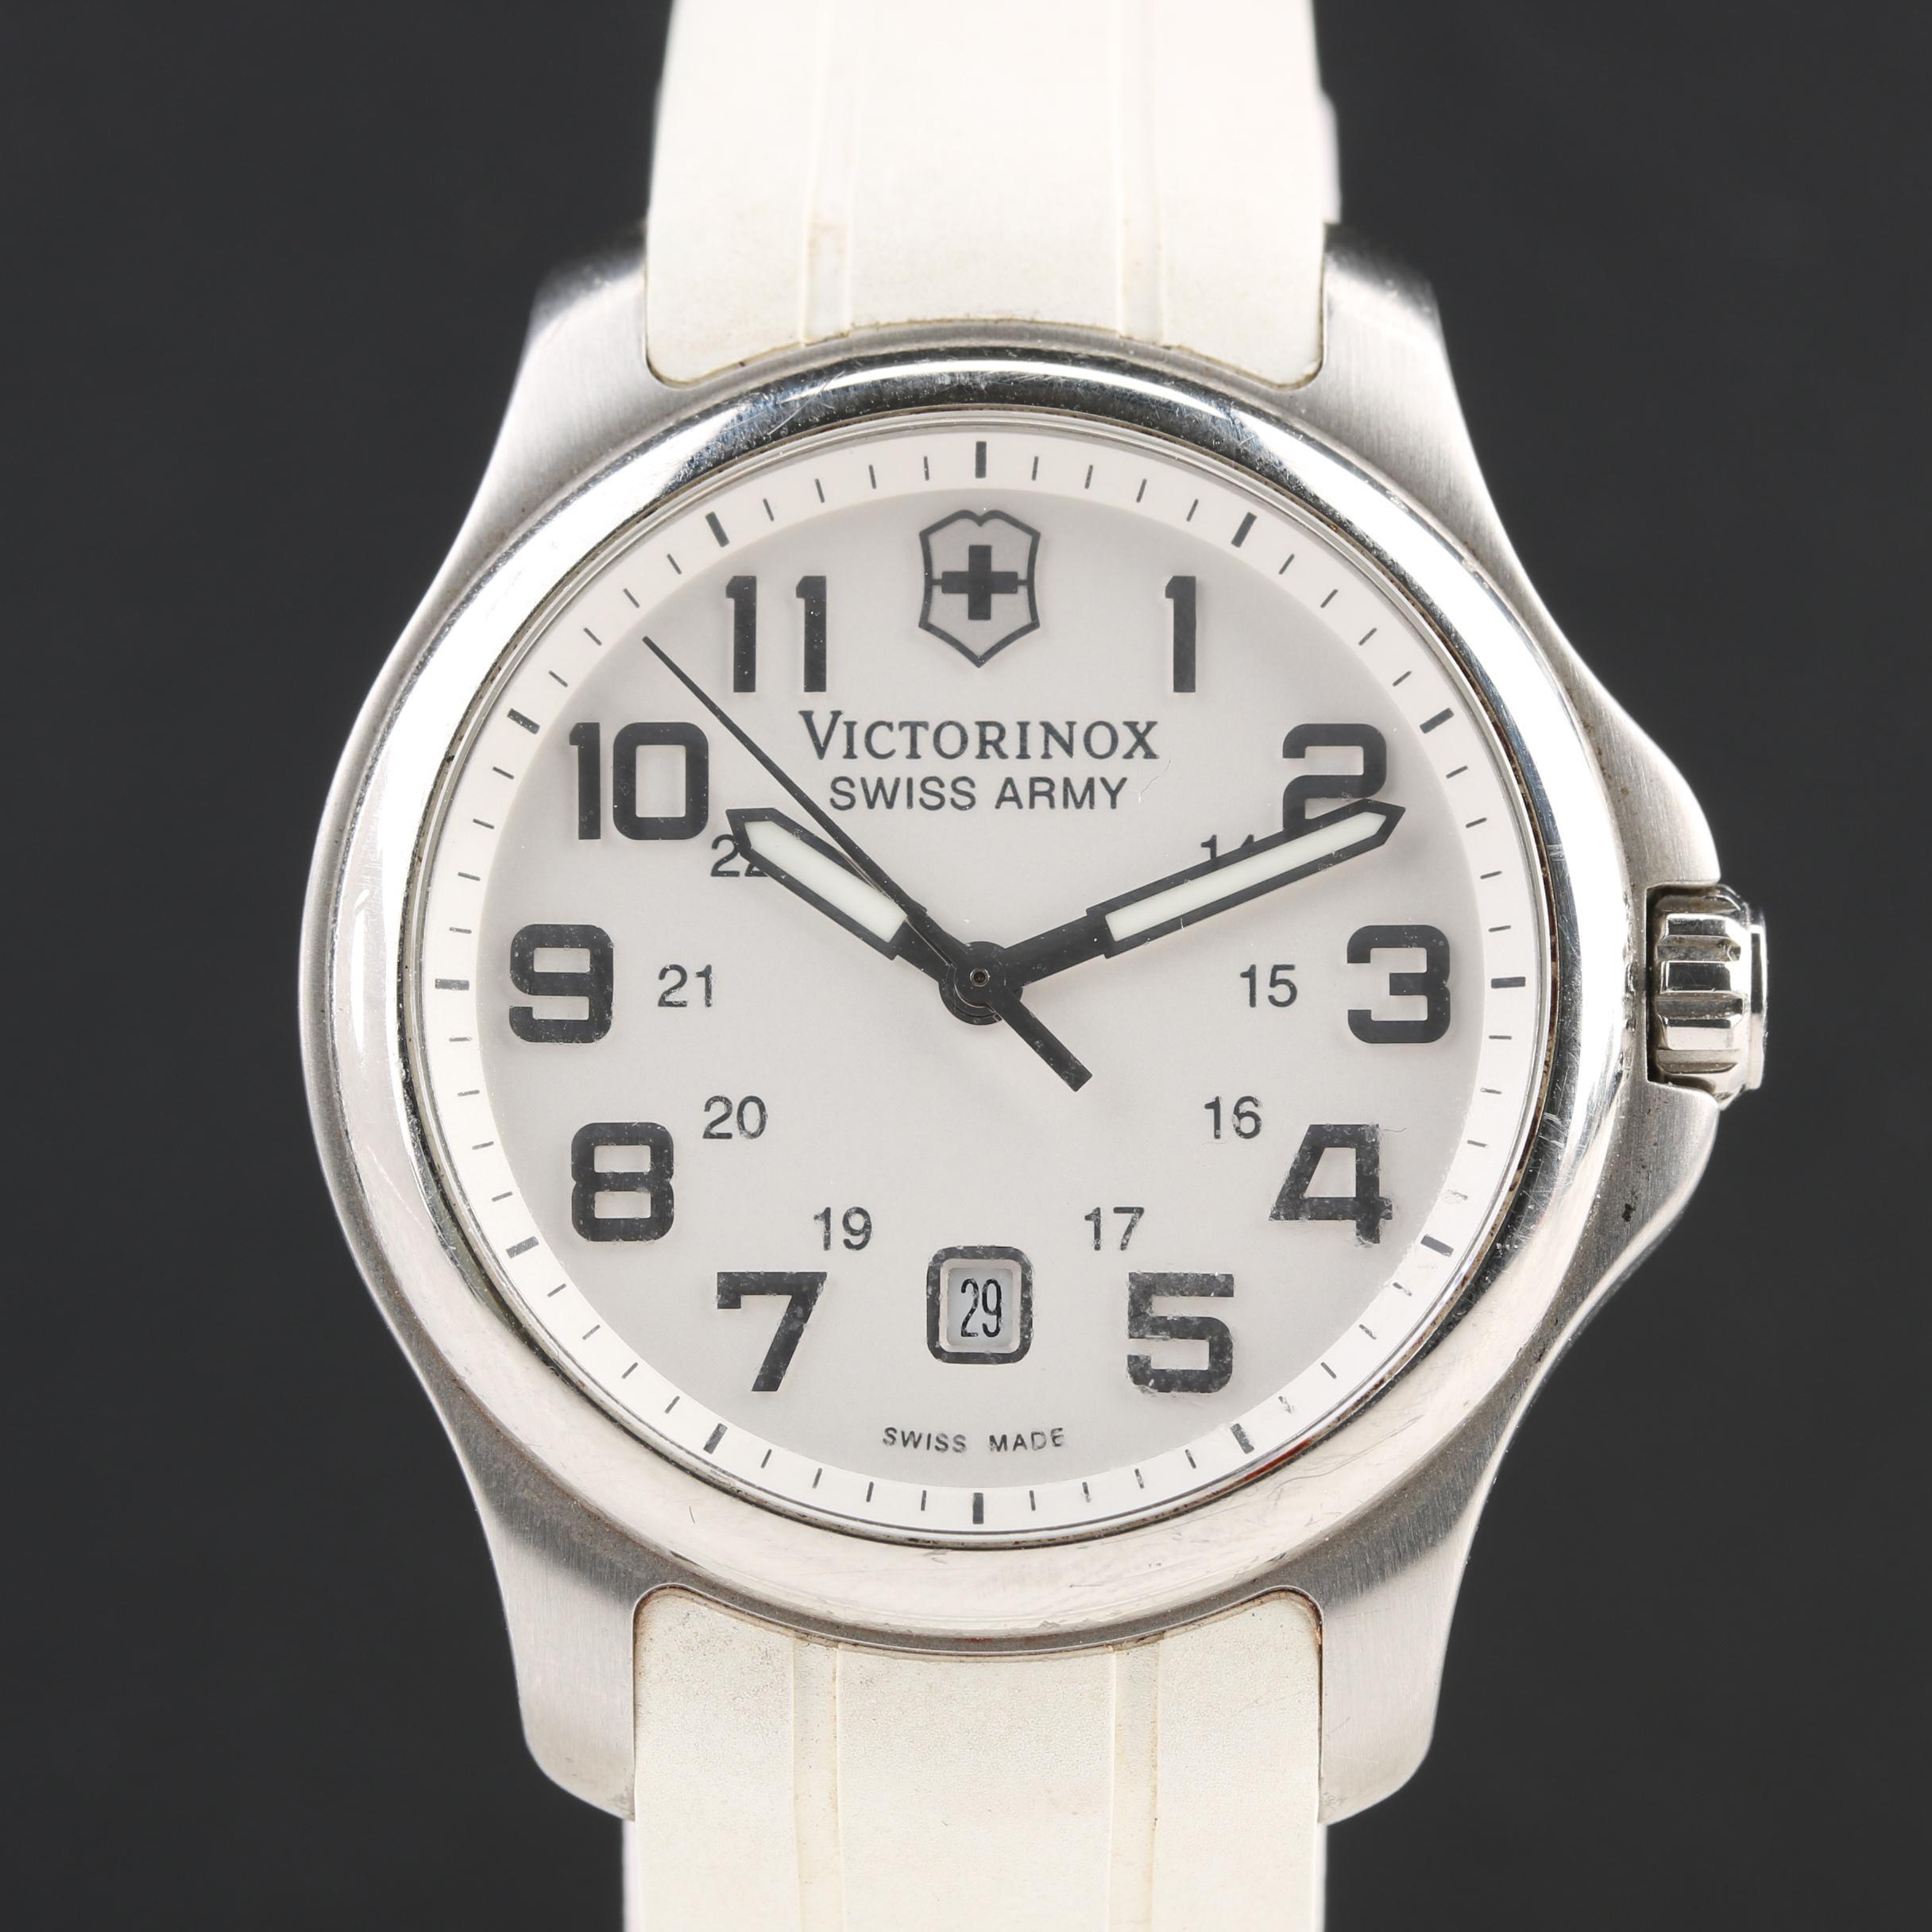 Victorinox Swiss Army Stainless Steel Wristwatch